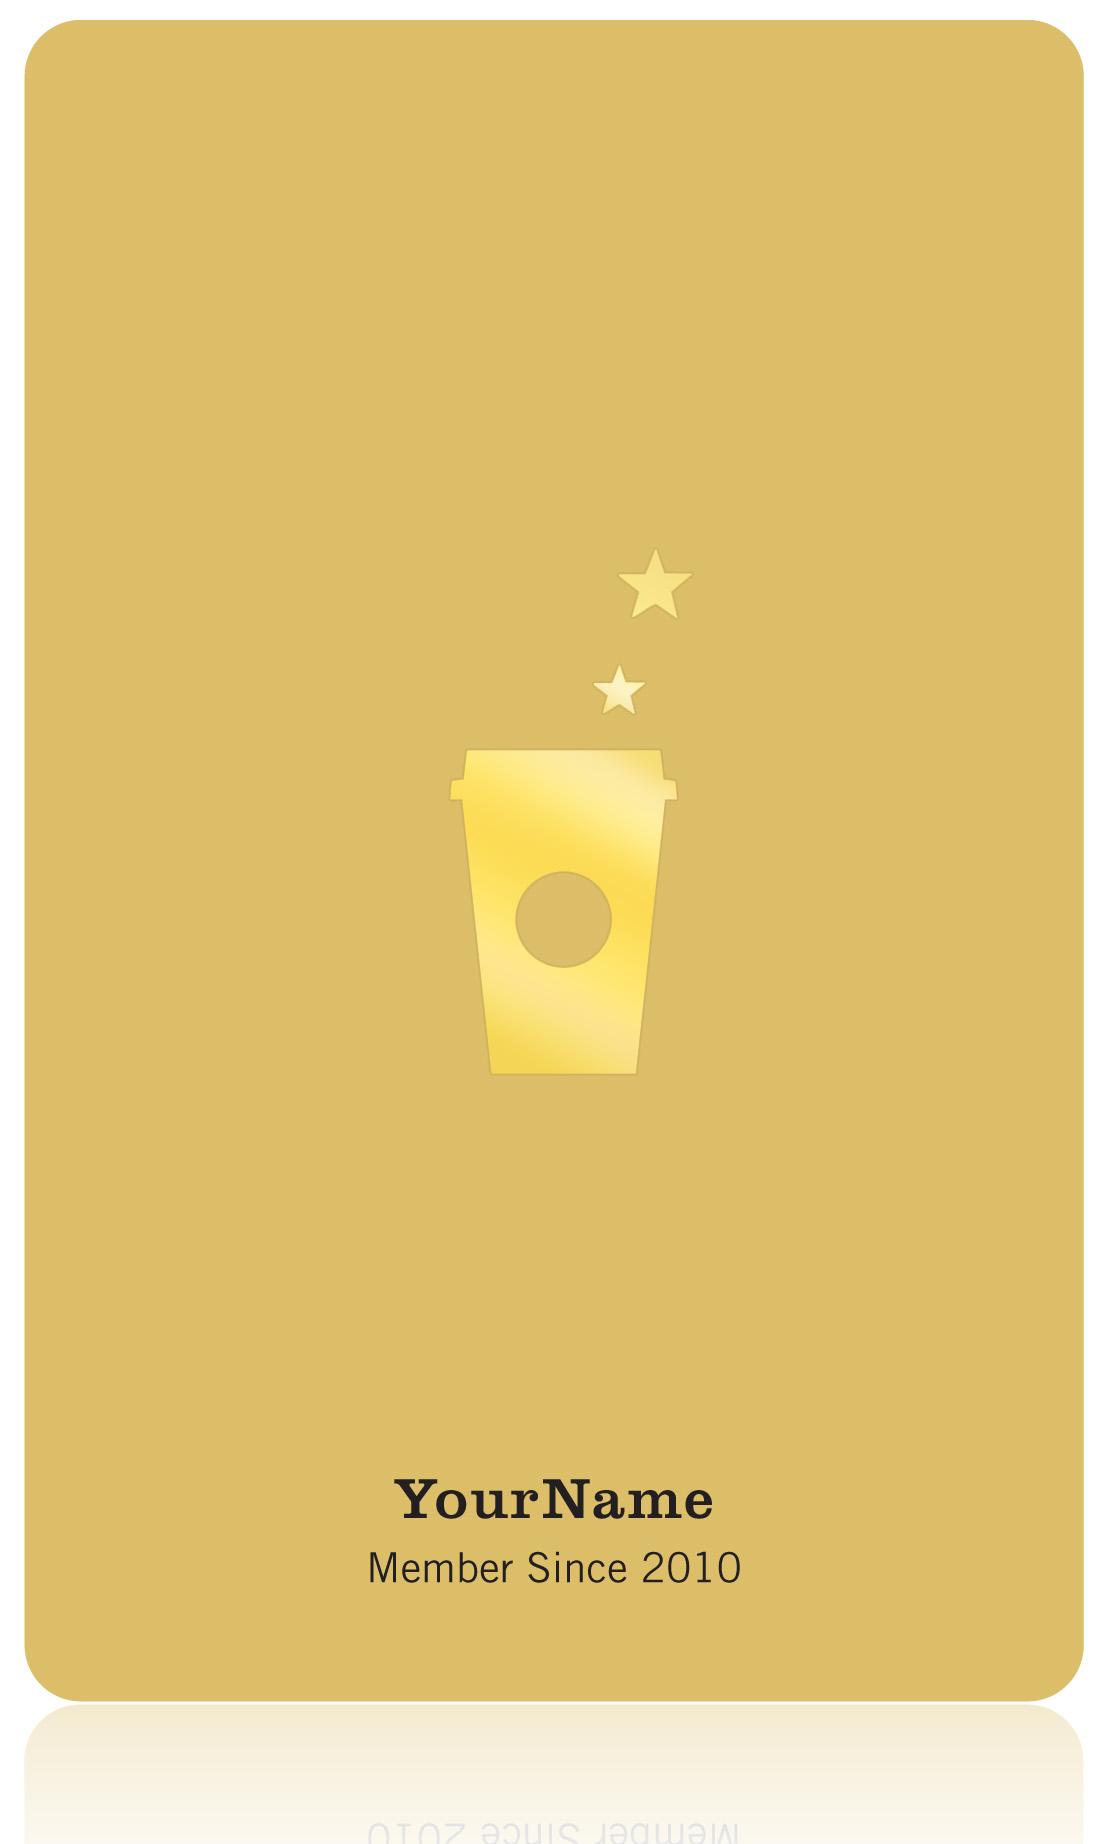 Starbucks Rewards Gold Card Benefits Savermetrics